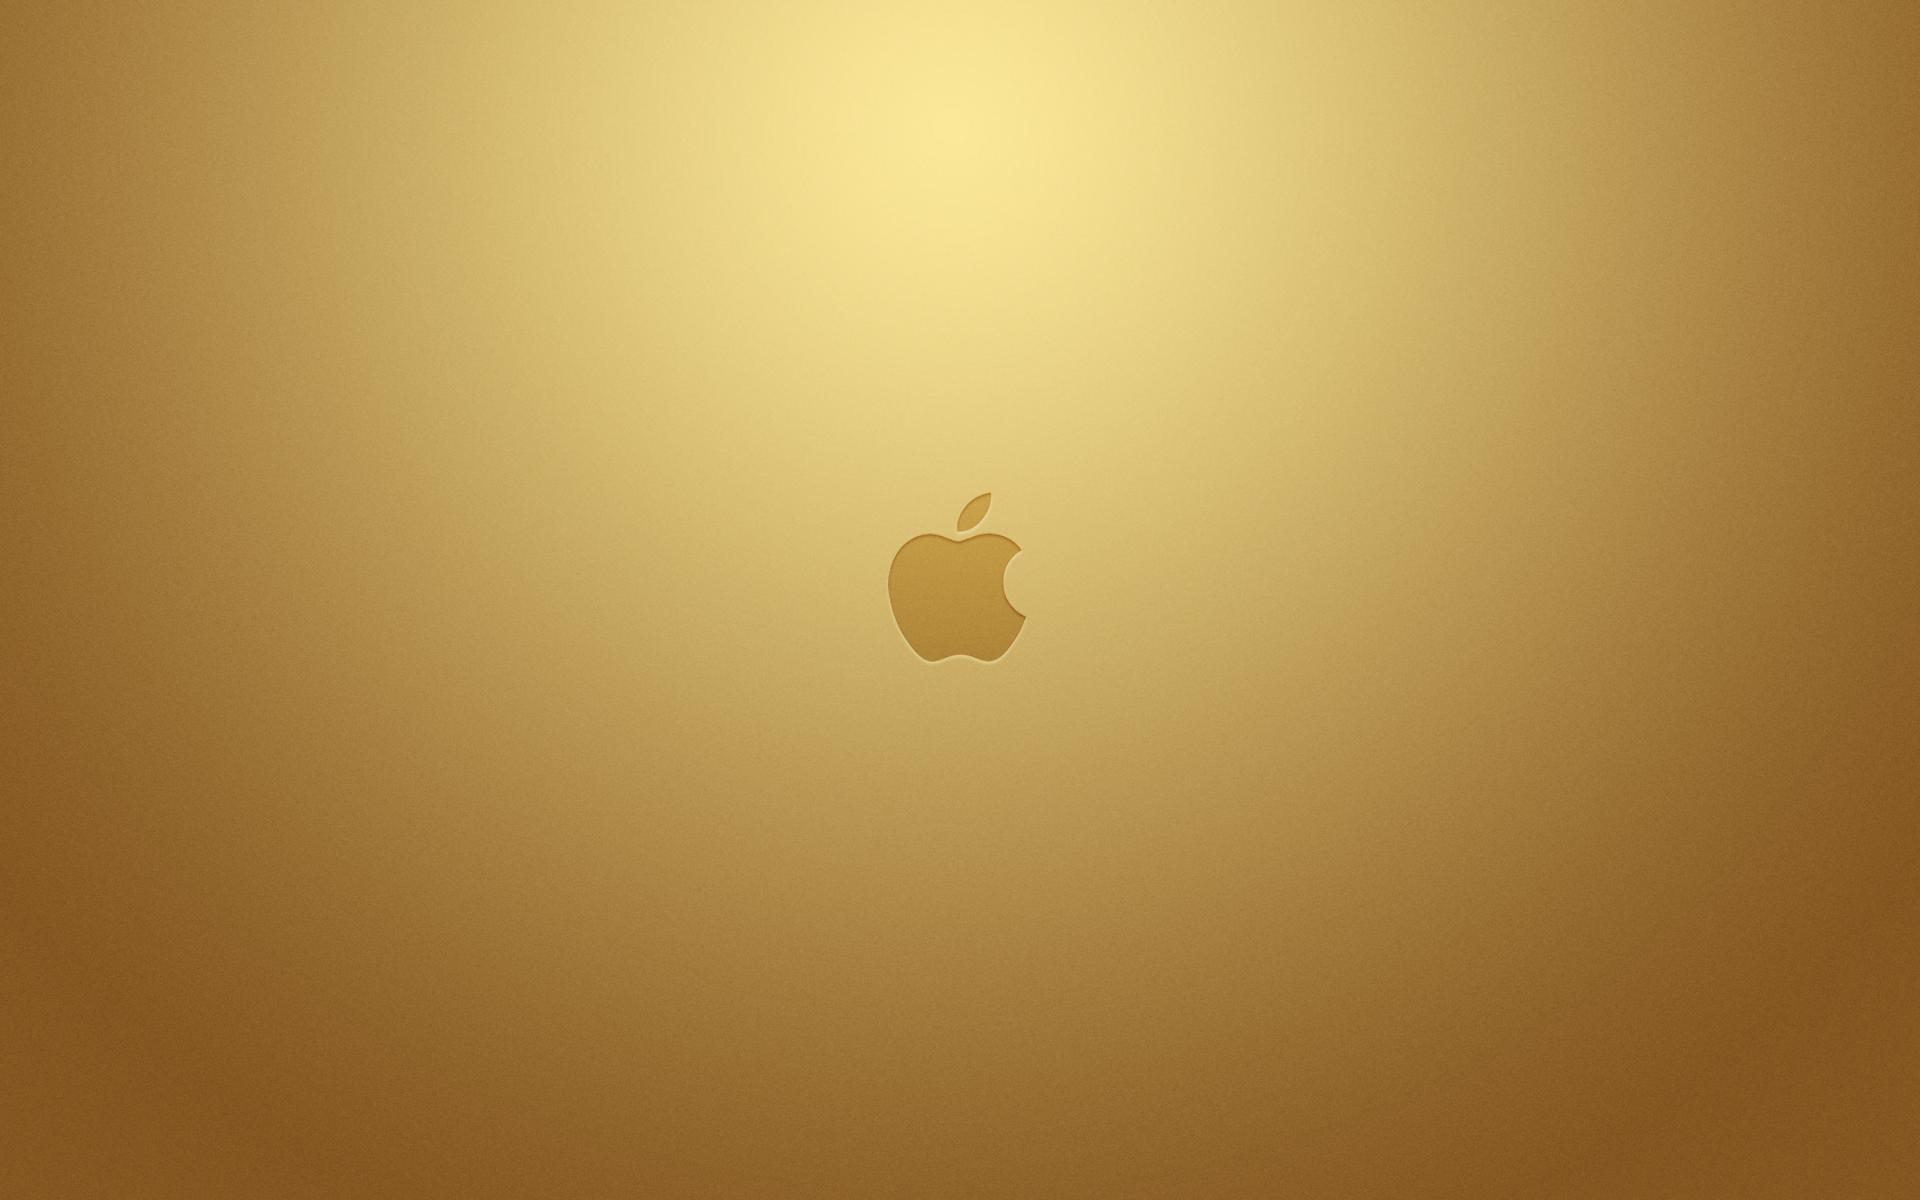 Gold Wallpaper Hd Resolution On Wallpaper Hd 1920 X - Apple Gold Wallpaper Mac , HD Wallpaper & Backgrounds